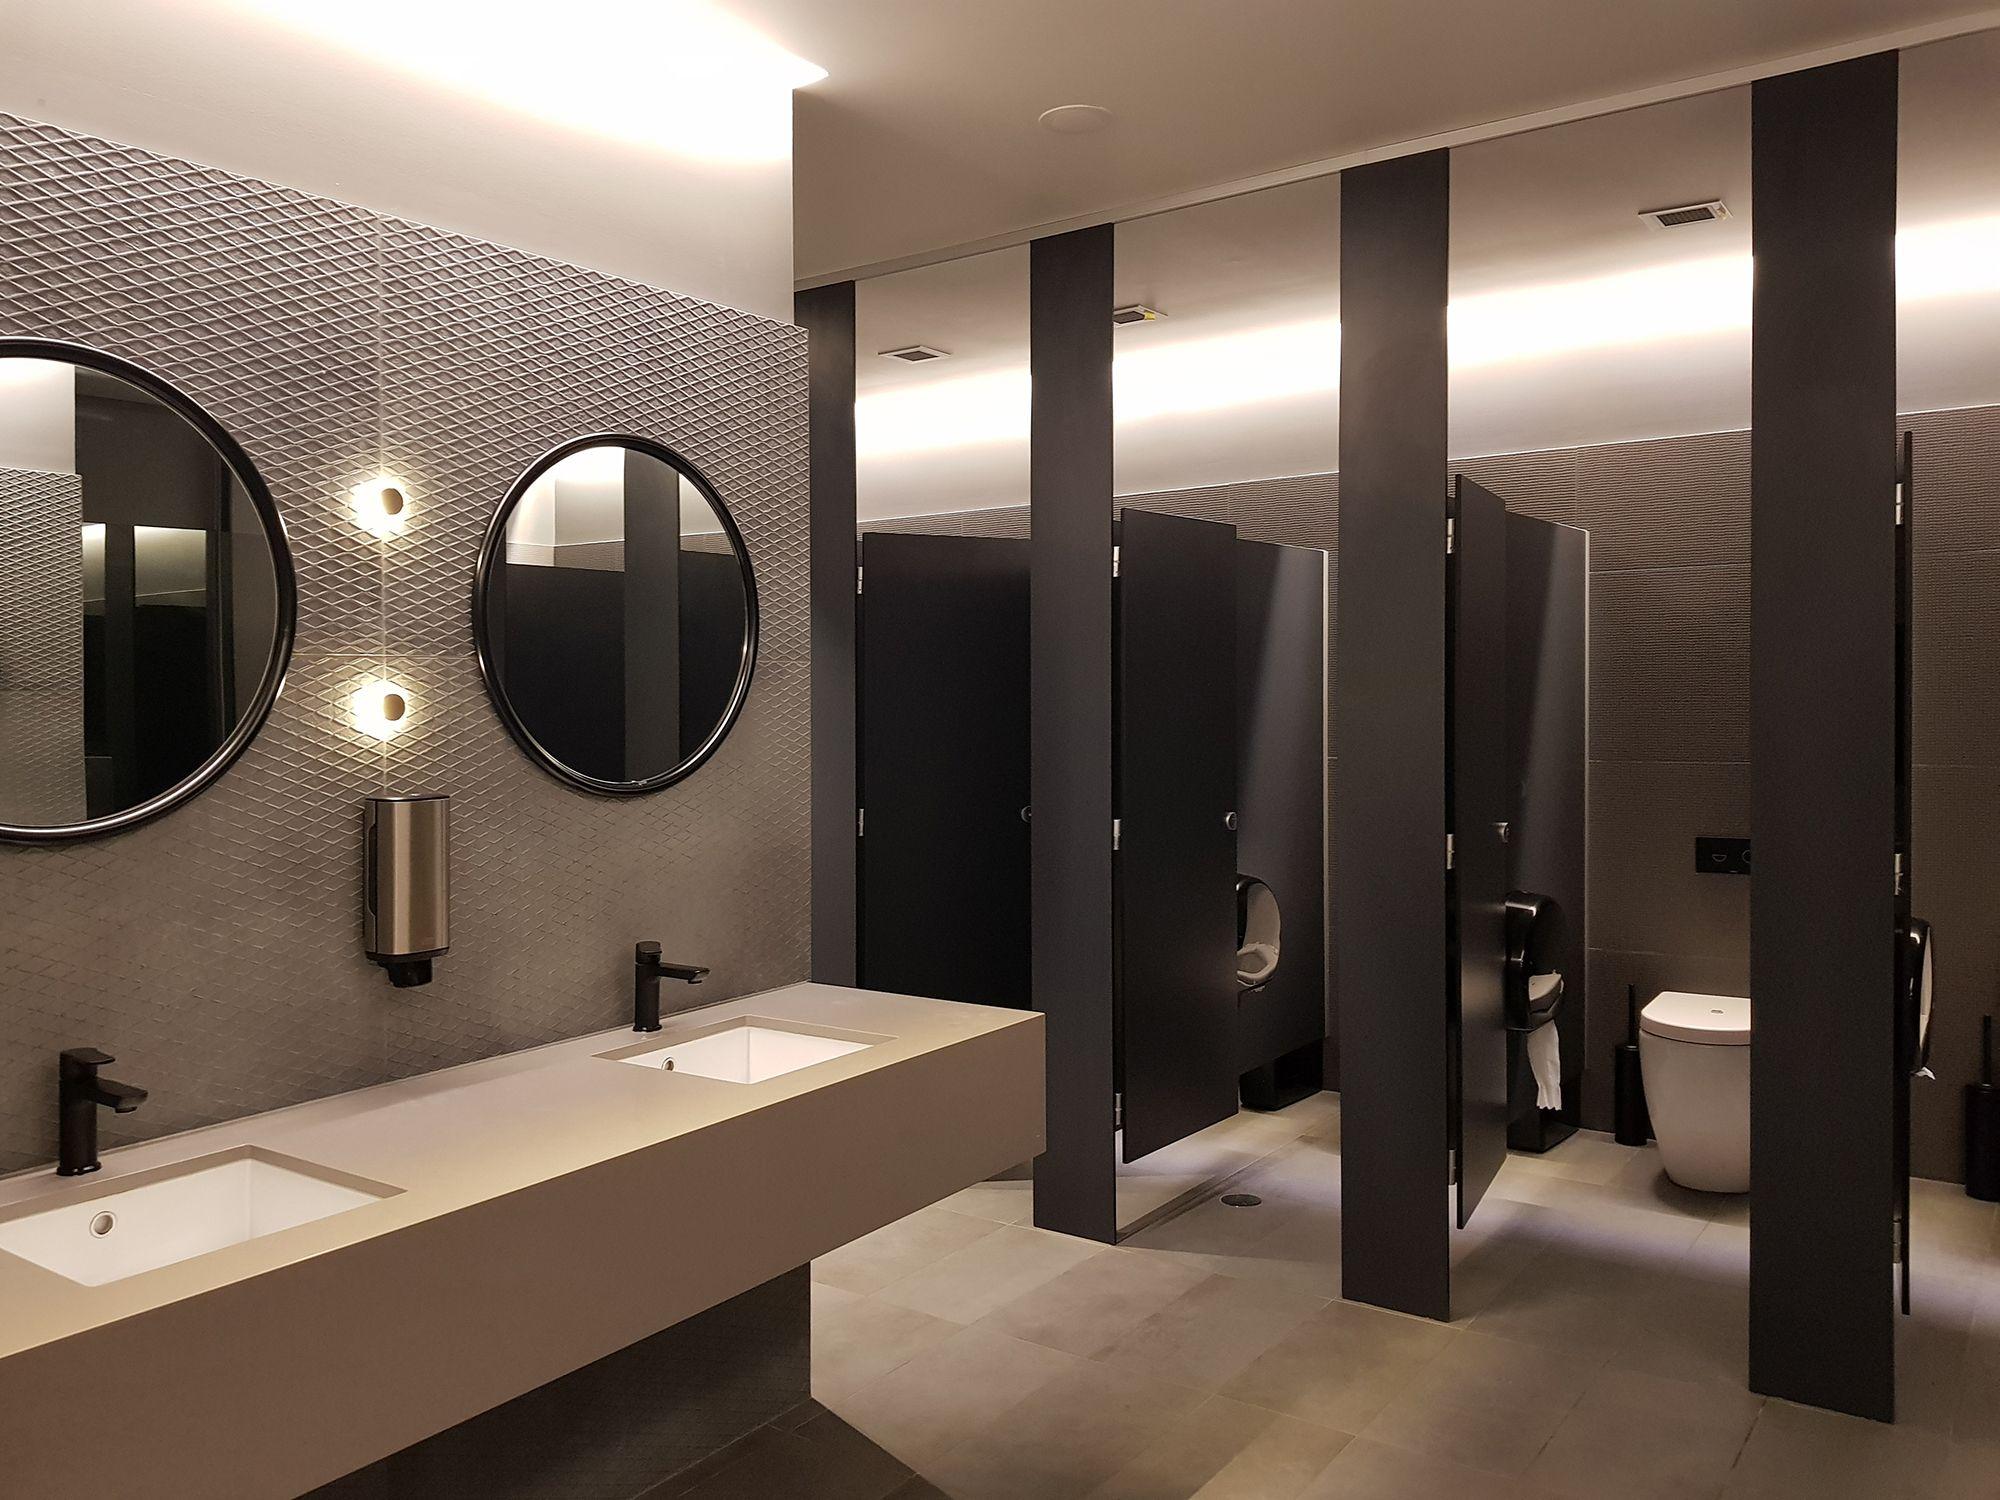 Aqualoo Windsor Compact Laminate Toilet Cubicles Restroom Design Washroom Design Toilet Design